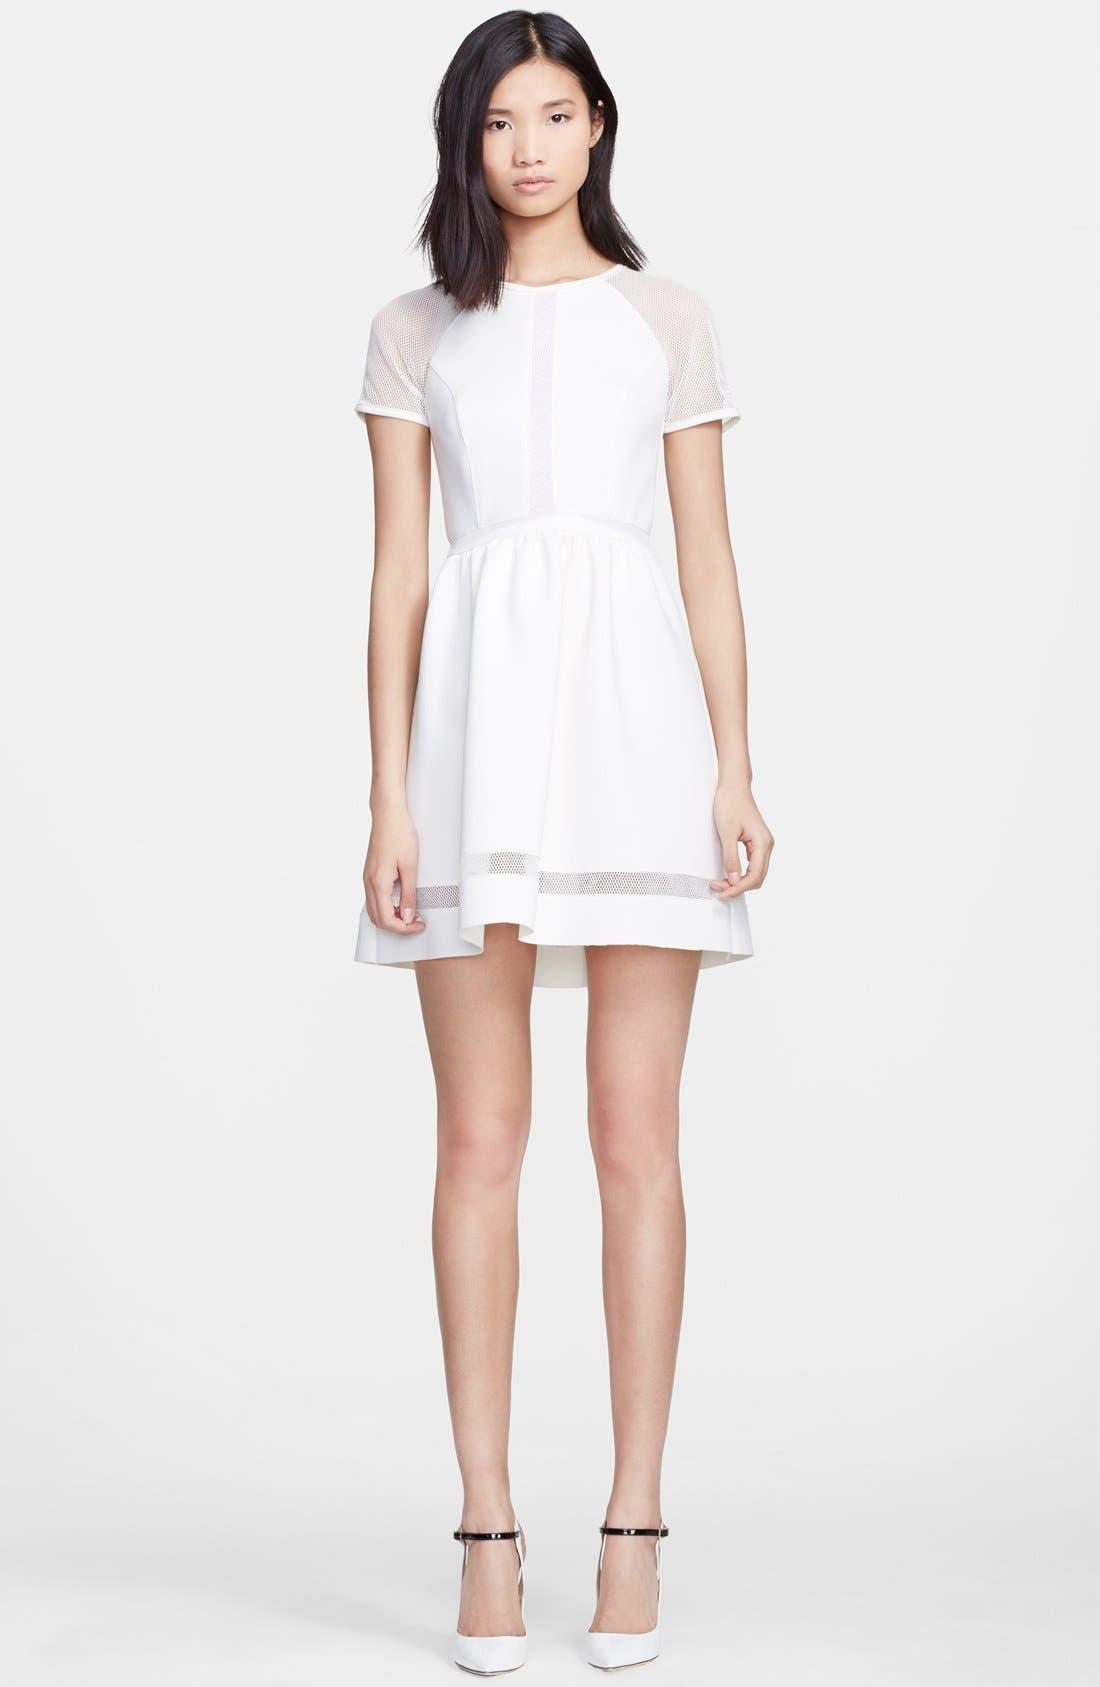 Alternate Image 1 Selected - Rachel Zoe 'Baxter' Fit & Flare Dress